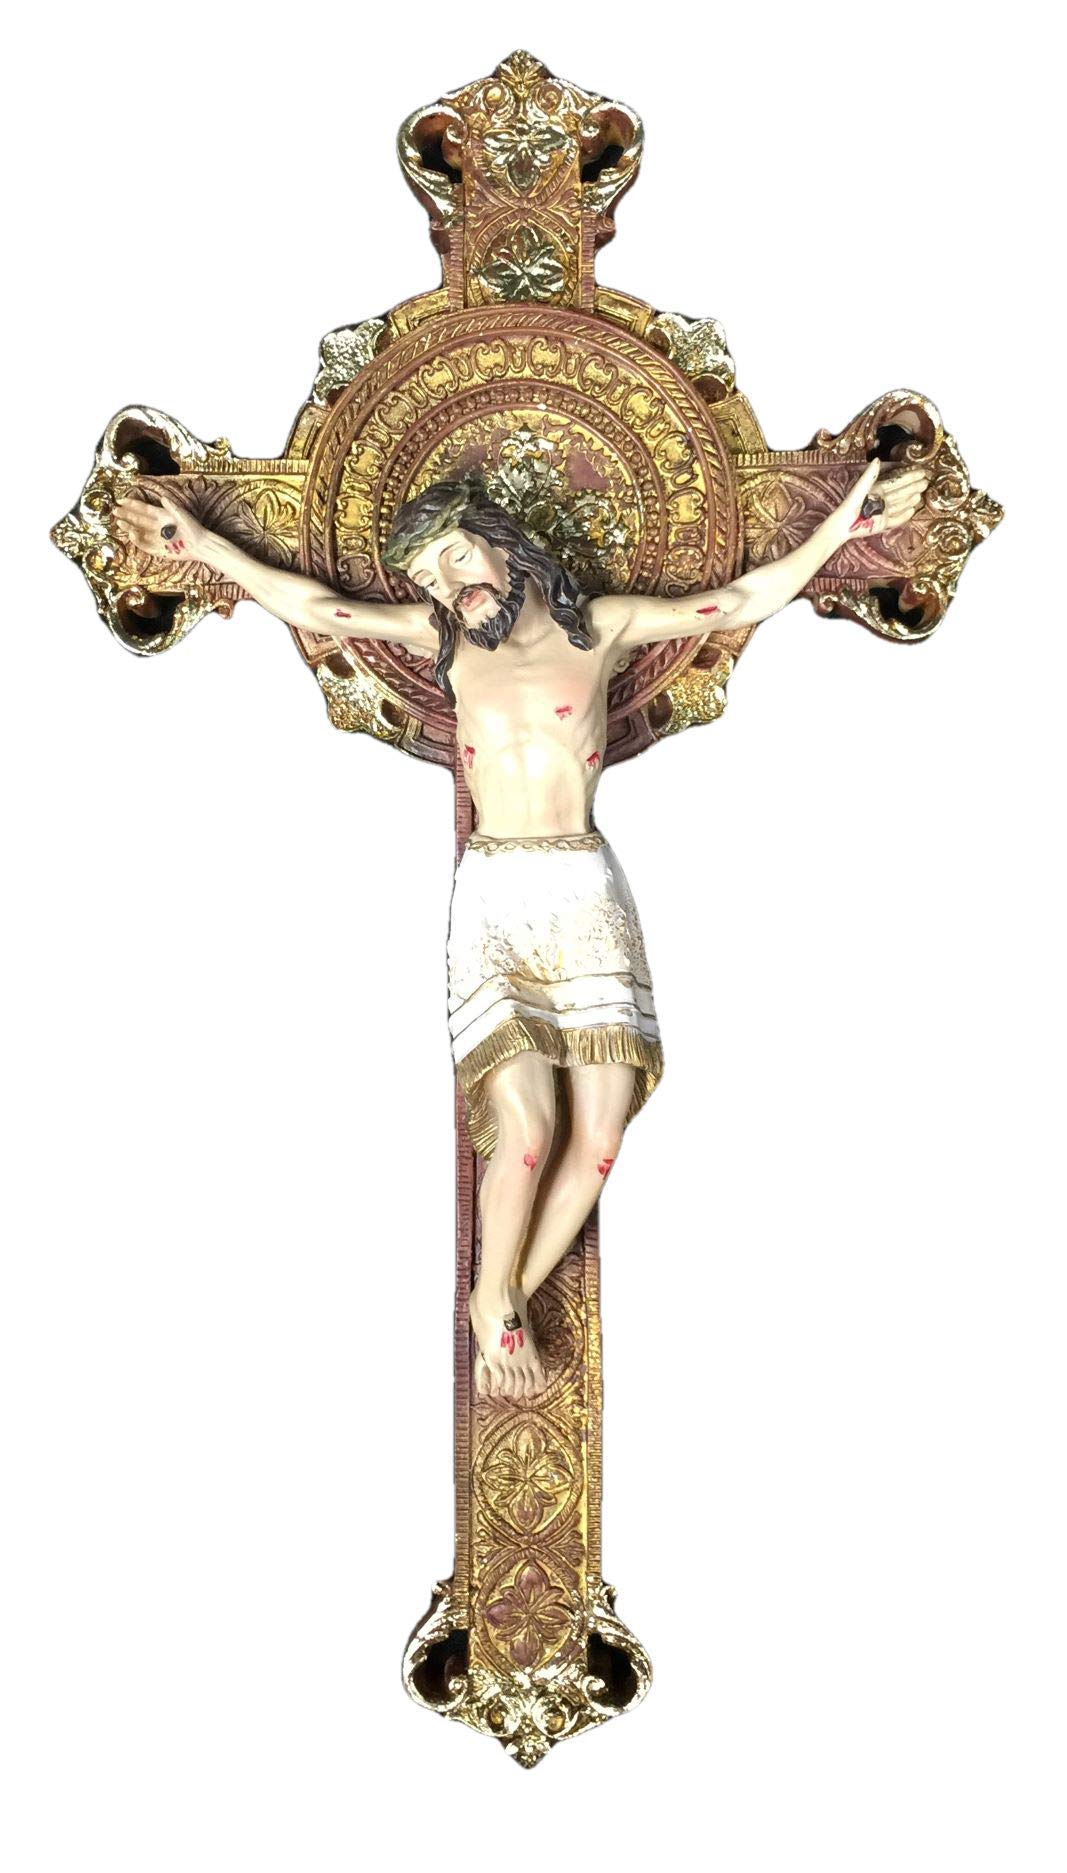 Osiris Trading UK Crucifix Hanging Wall Cross Resin Corpus Christi Jesus Christ Religious Ornament